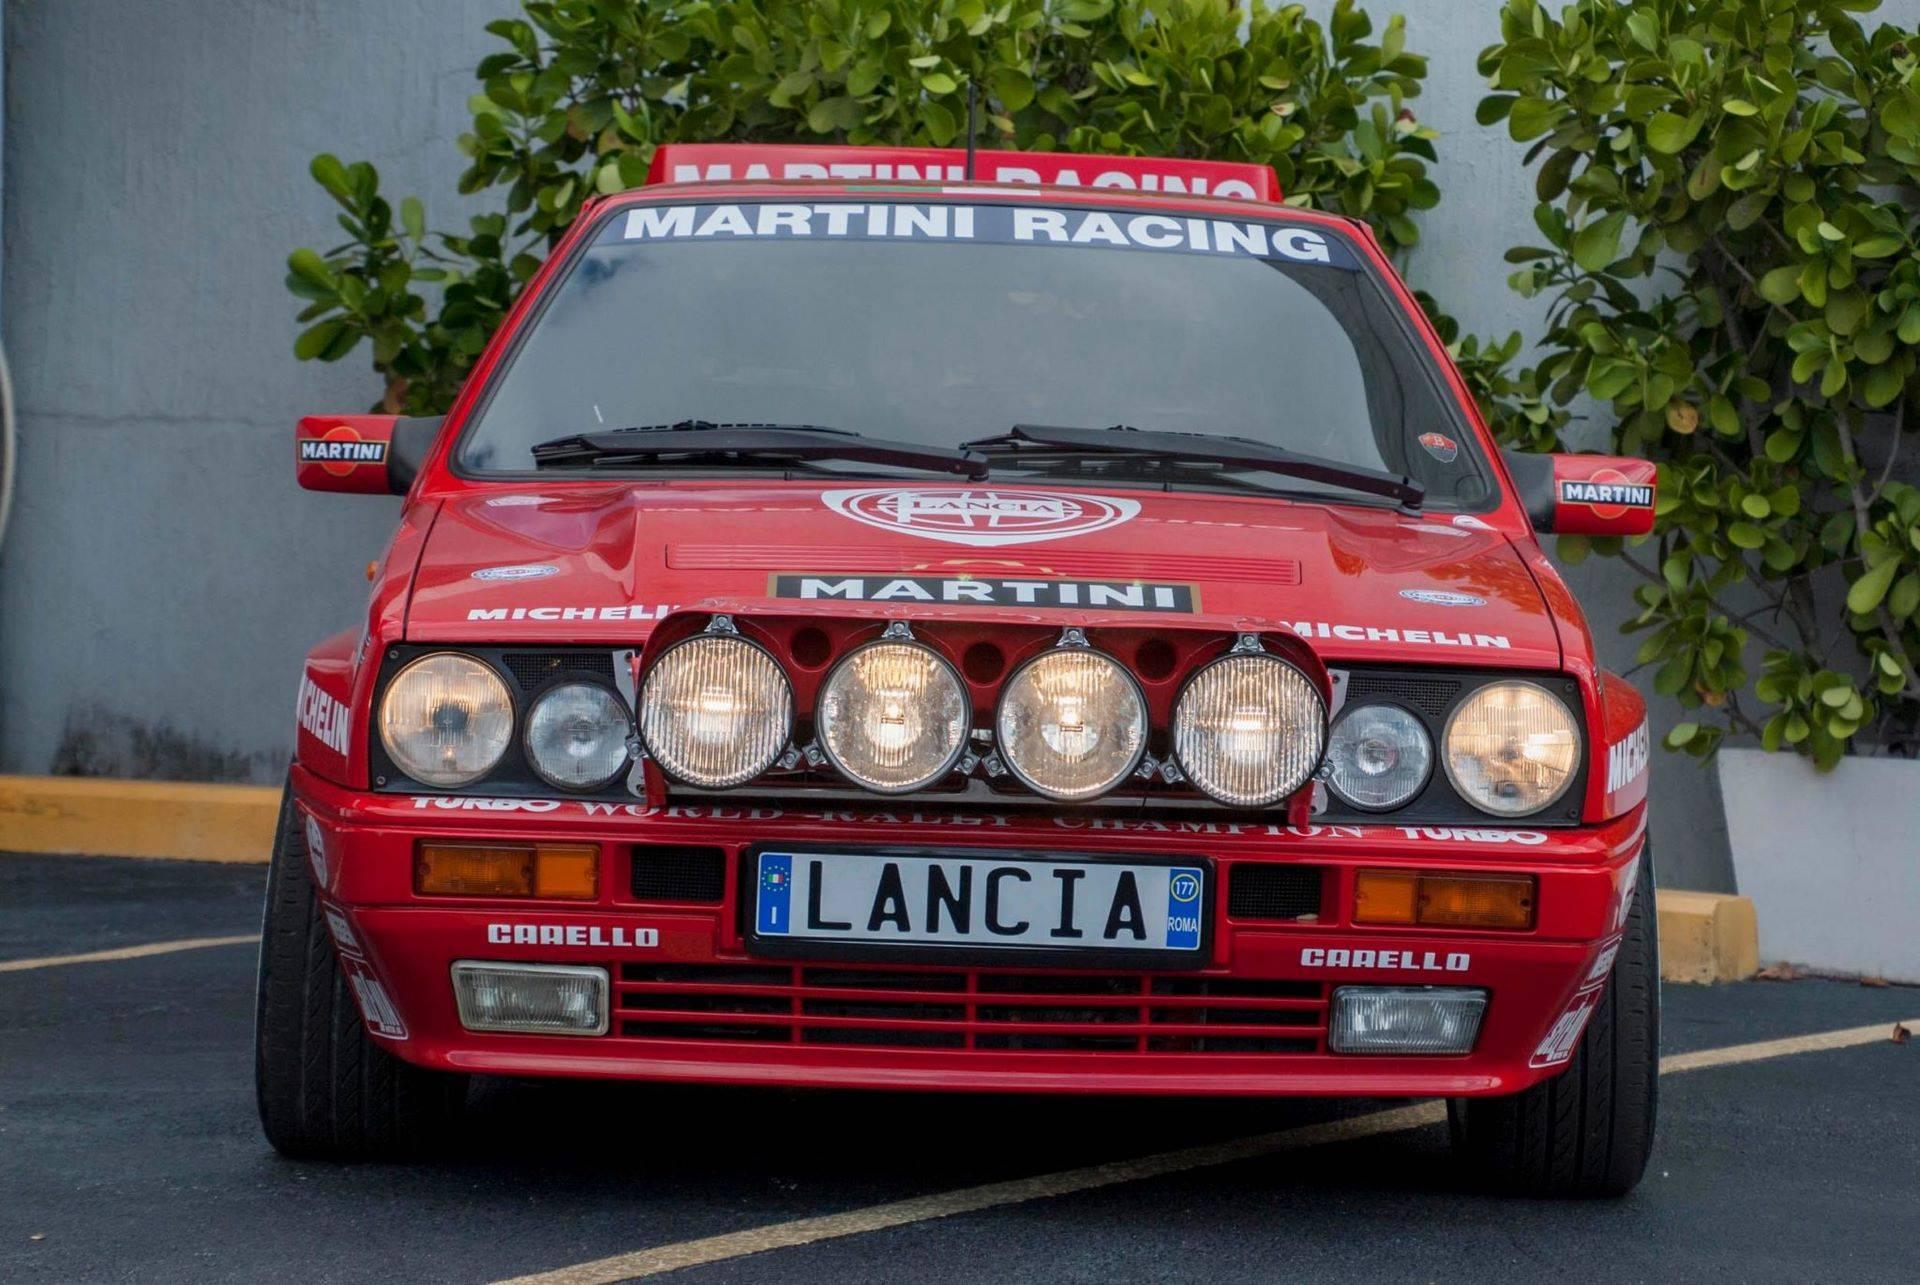 Lancia-Delta-Integrale-8V-1989-87